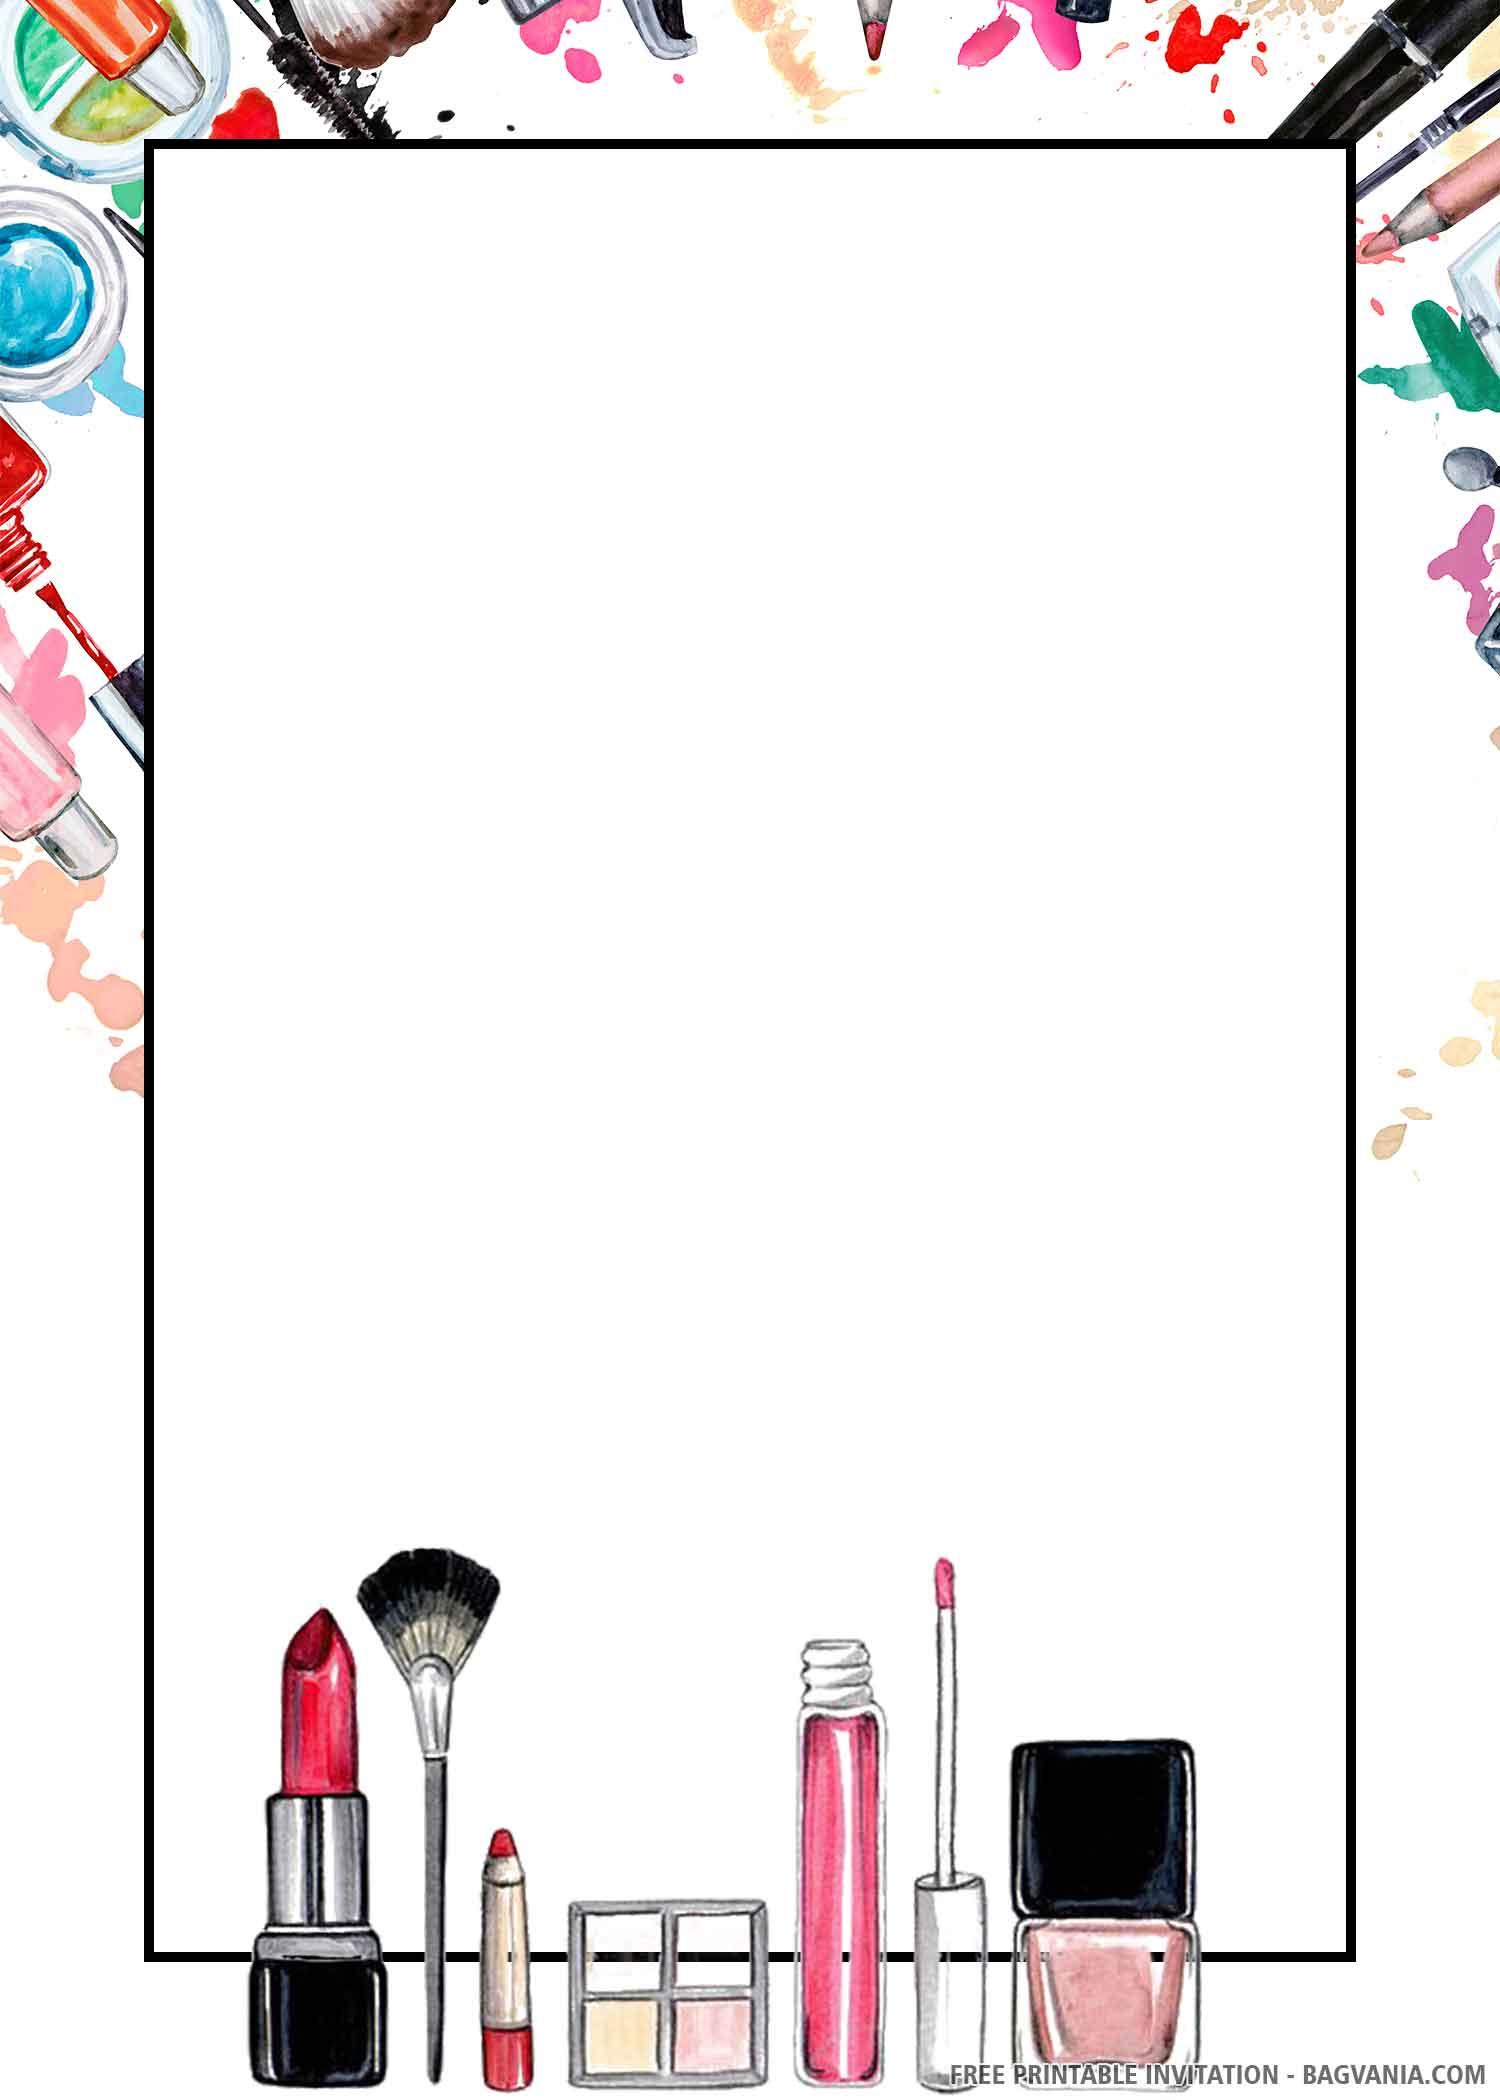 Free Printable Cosmetic Birthday Invitation Templates